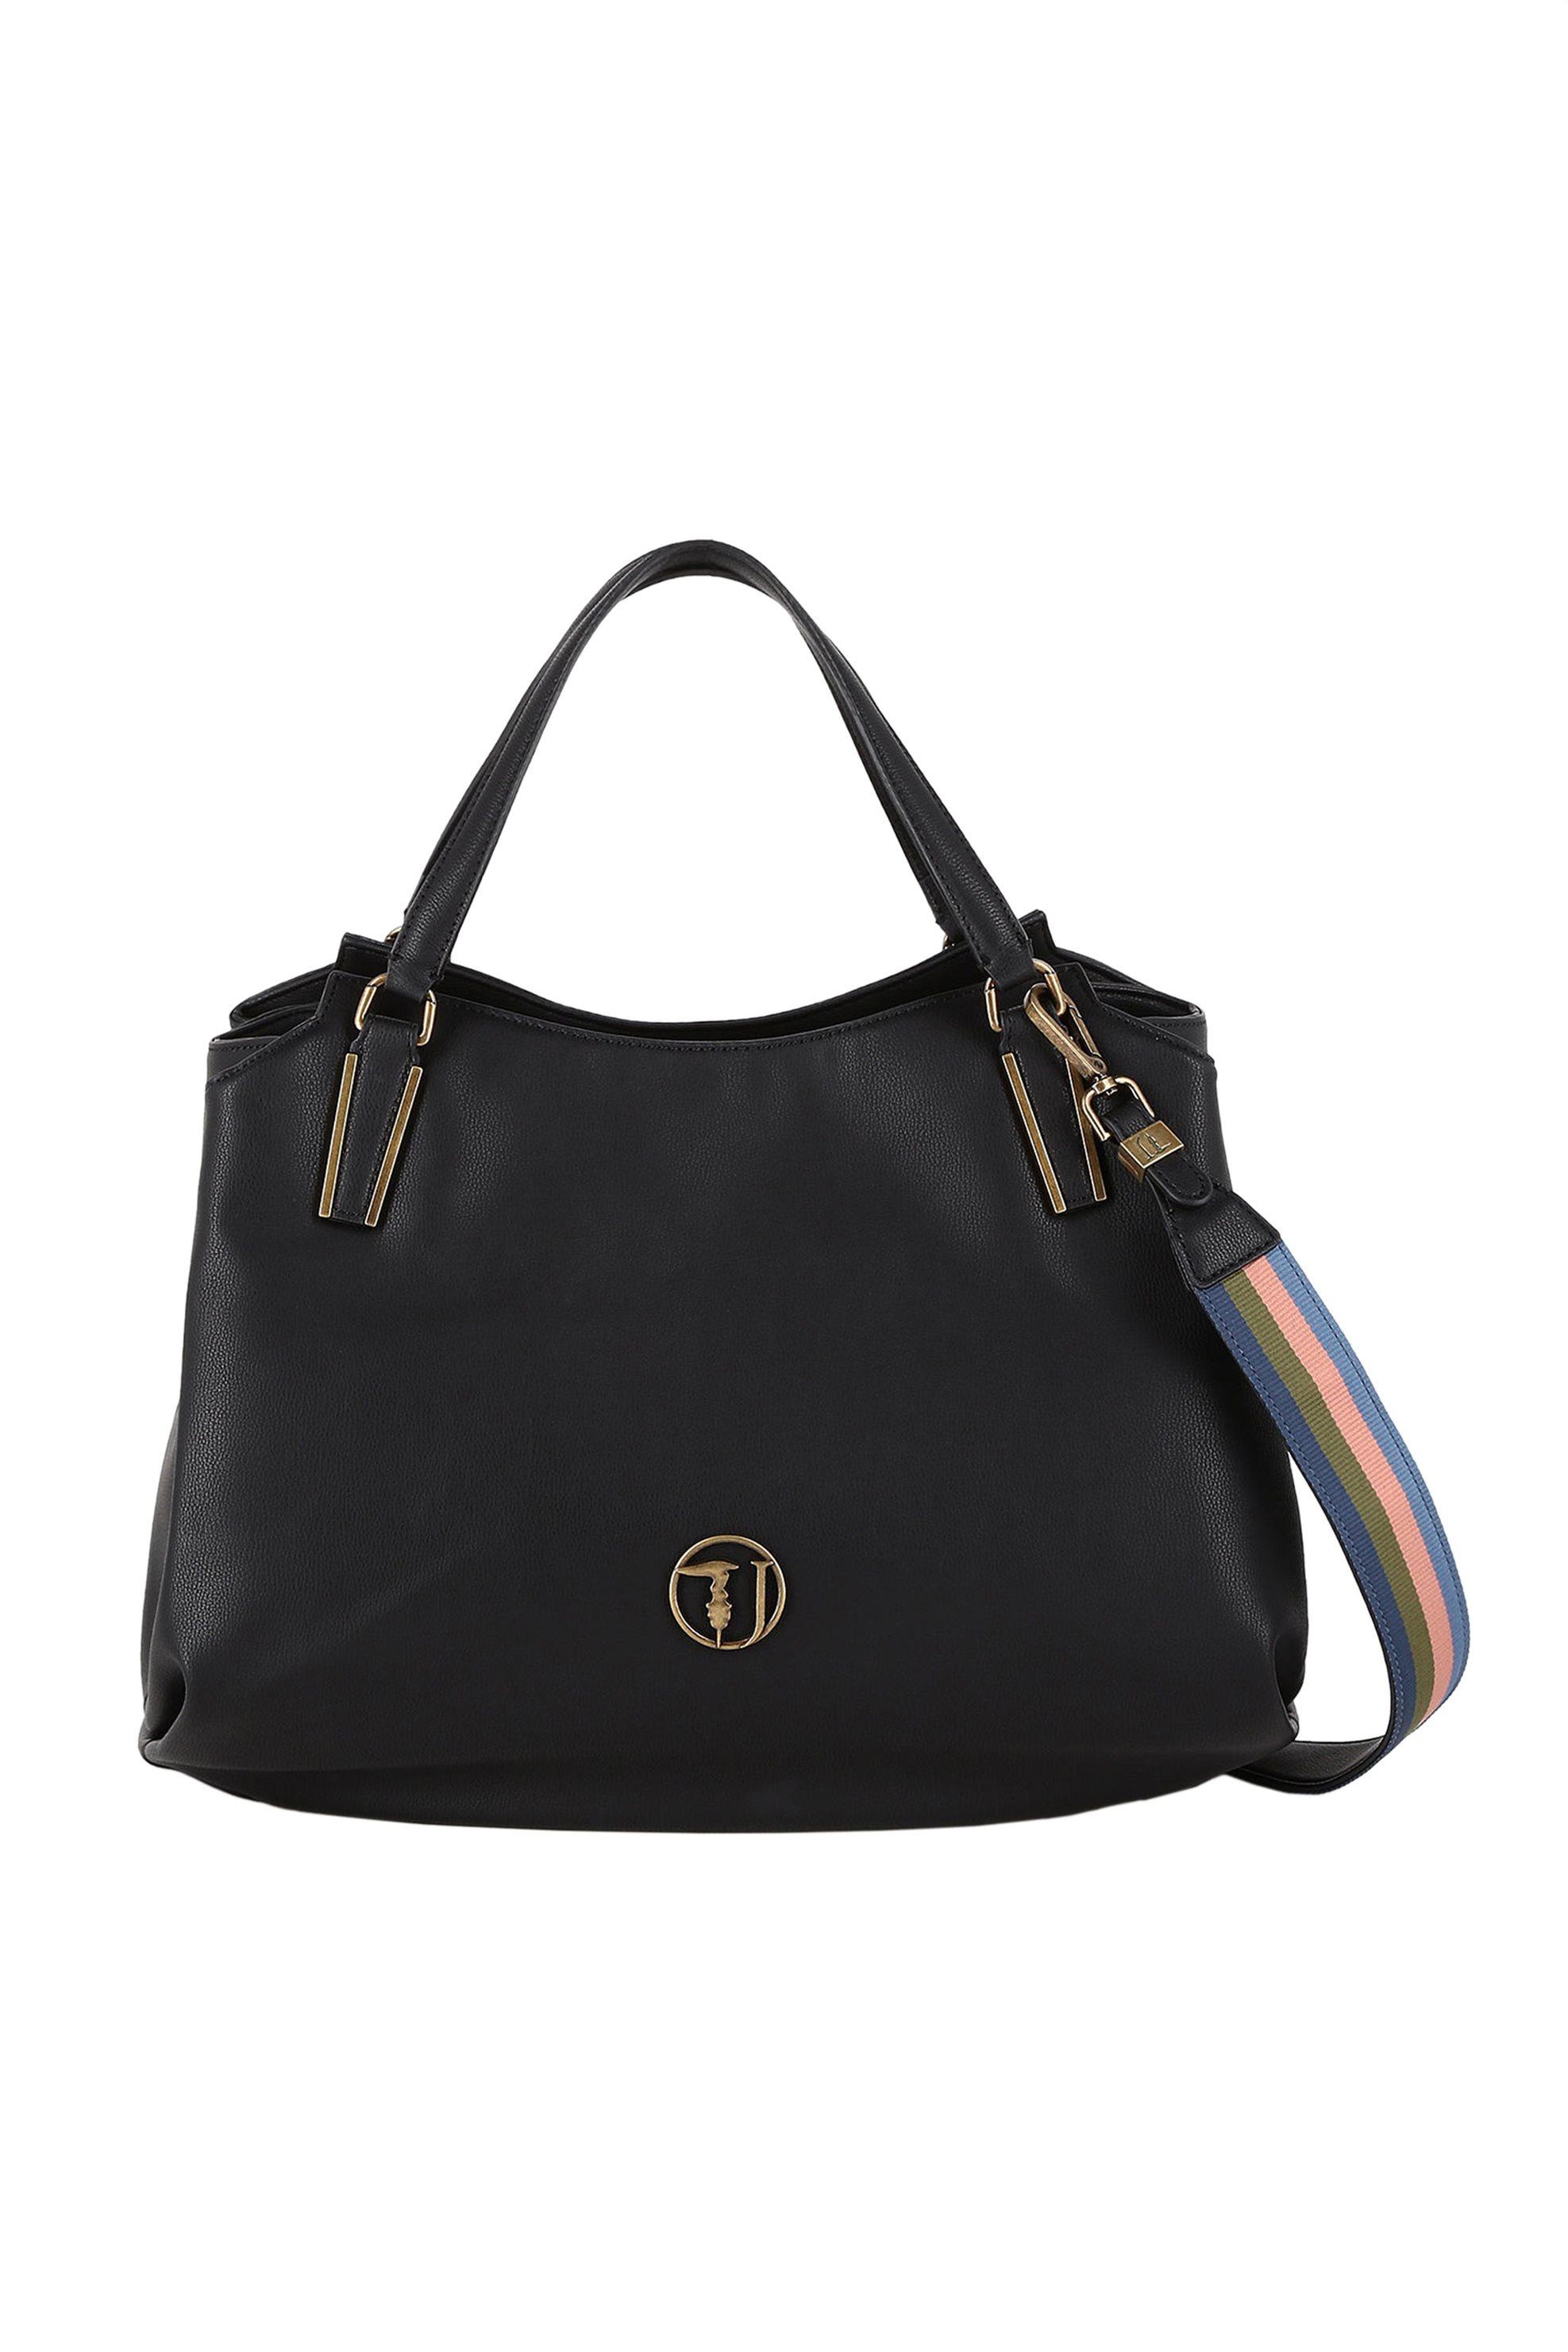 Trussardi Jeans γυναικεία τσάντα Rabarbaro Tote - 75B00551-9Y099999 - Μαύρο γυναικα   τσαντεσ   τσάντες χειρός